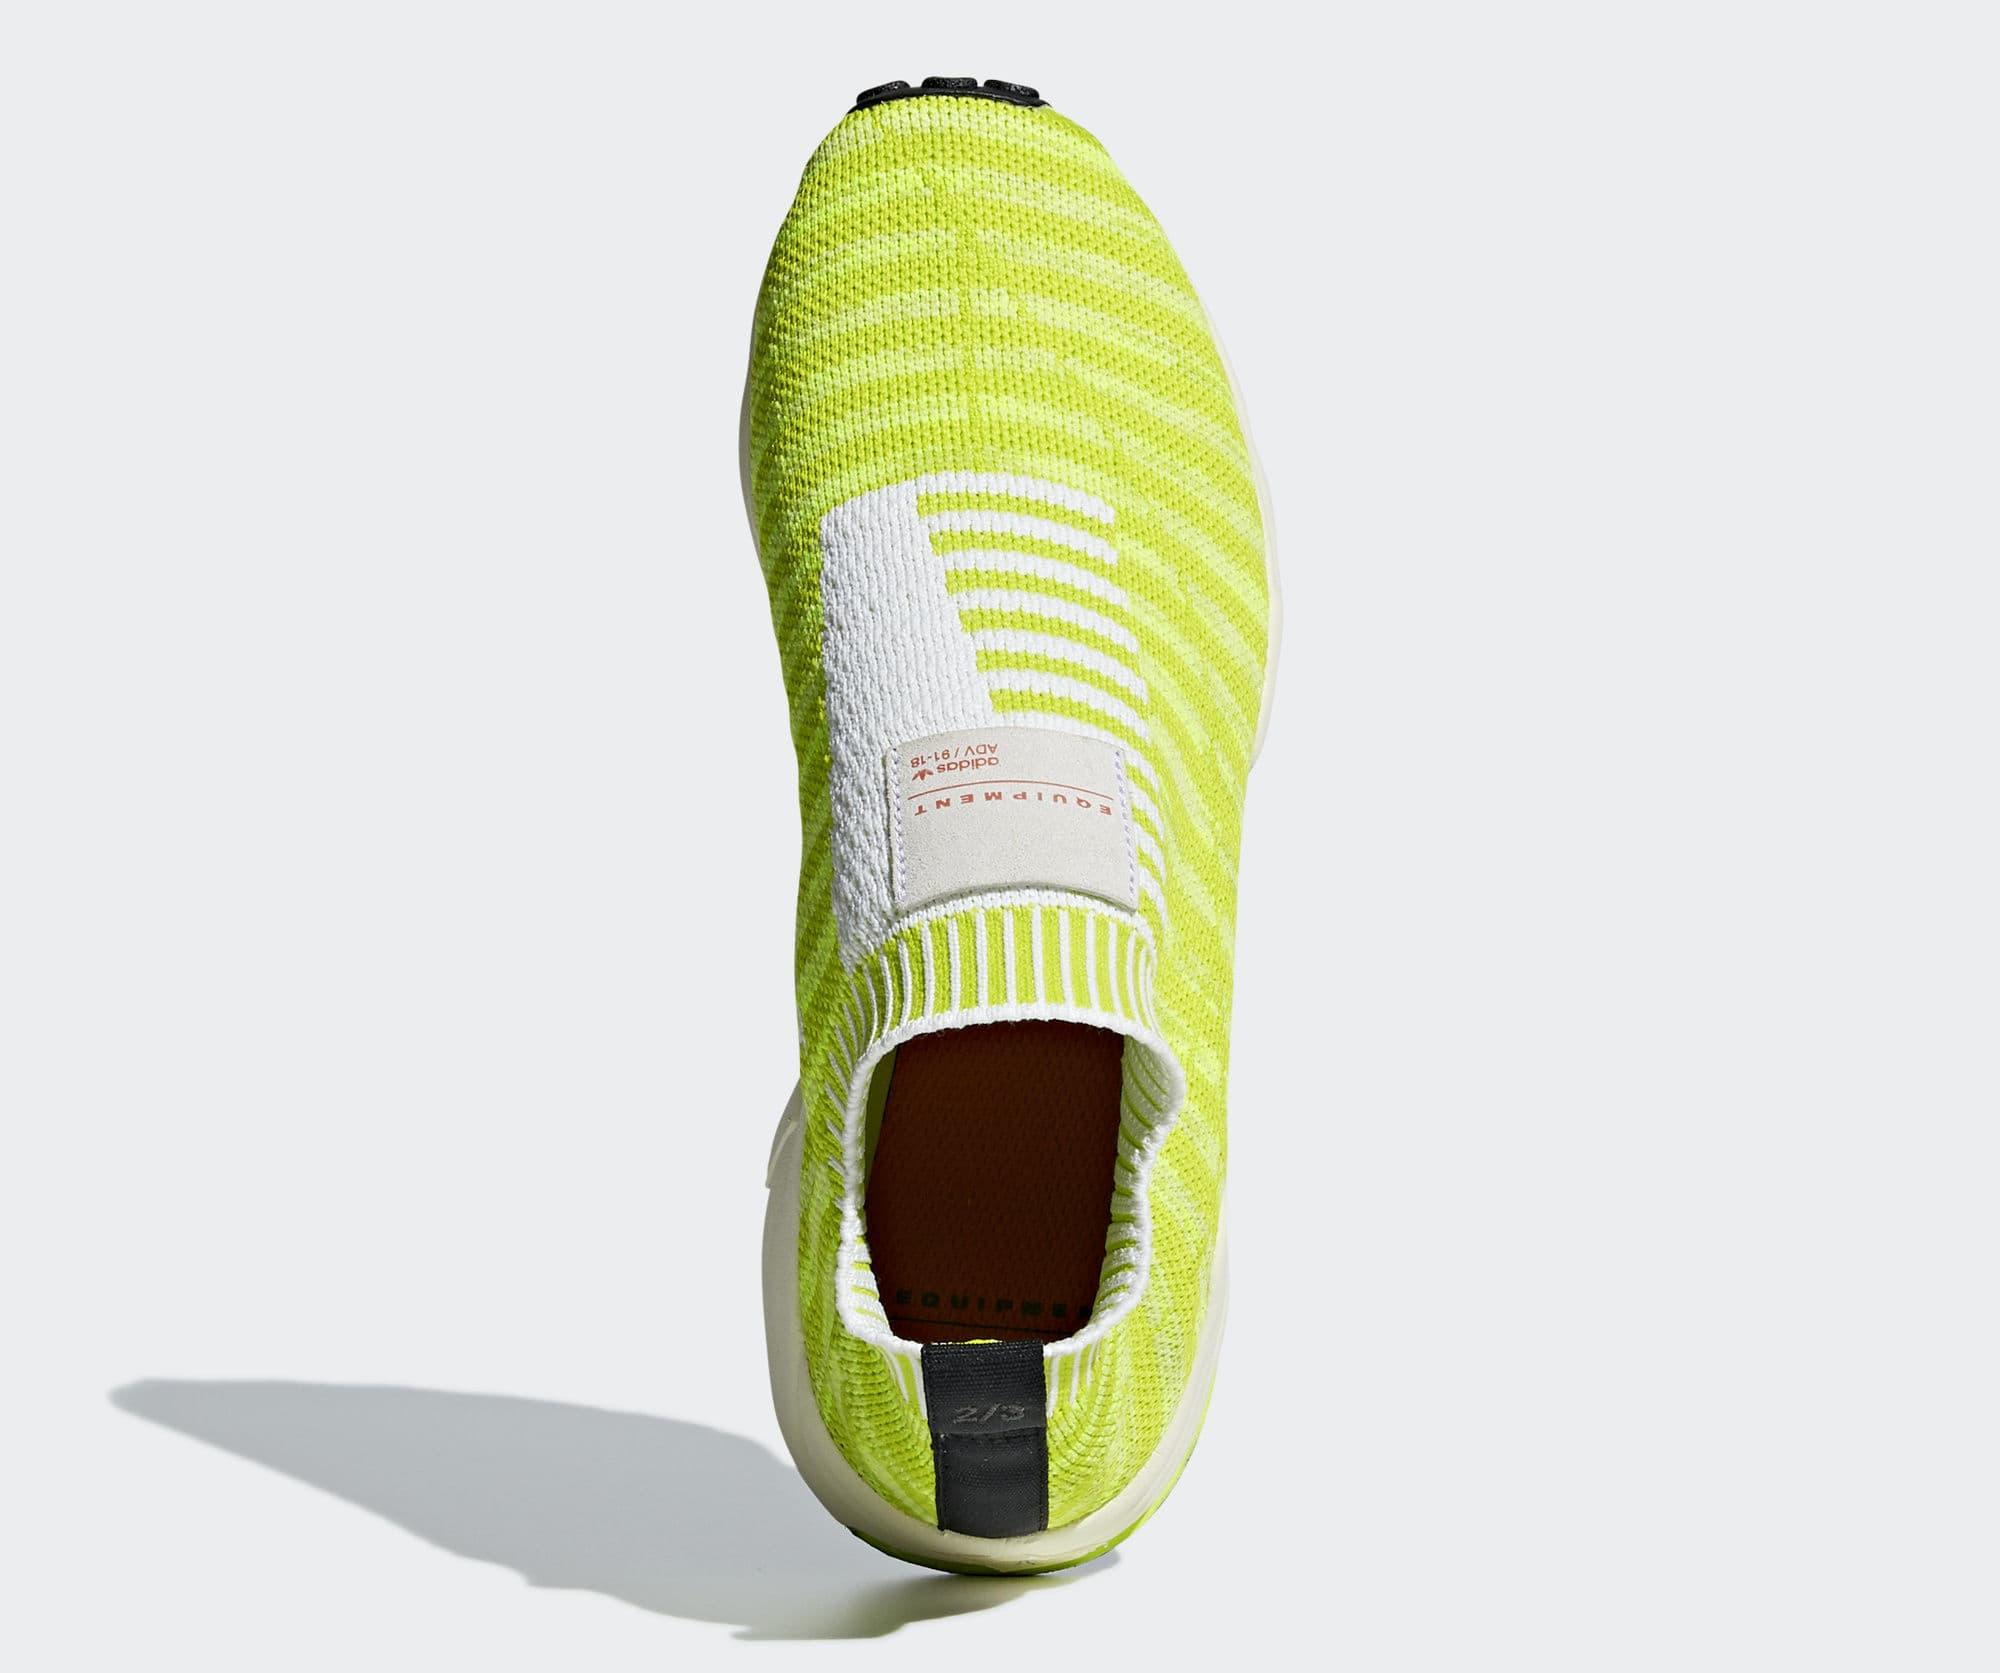 Adidas EQT Support Sock PK 'Solar Yellow' B37545 (Top)